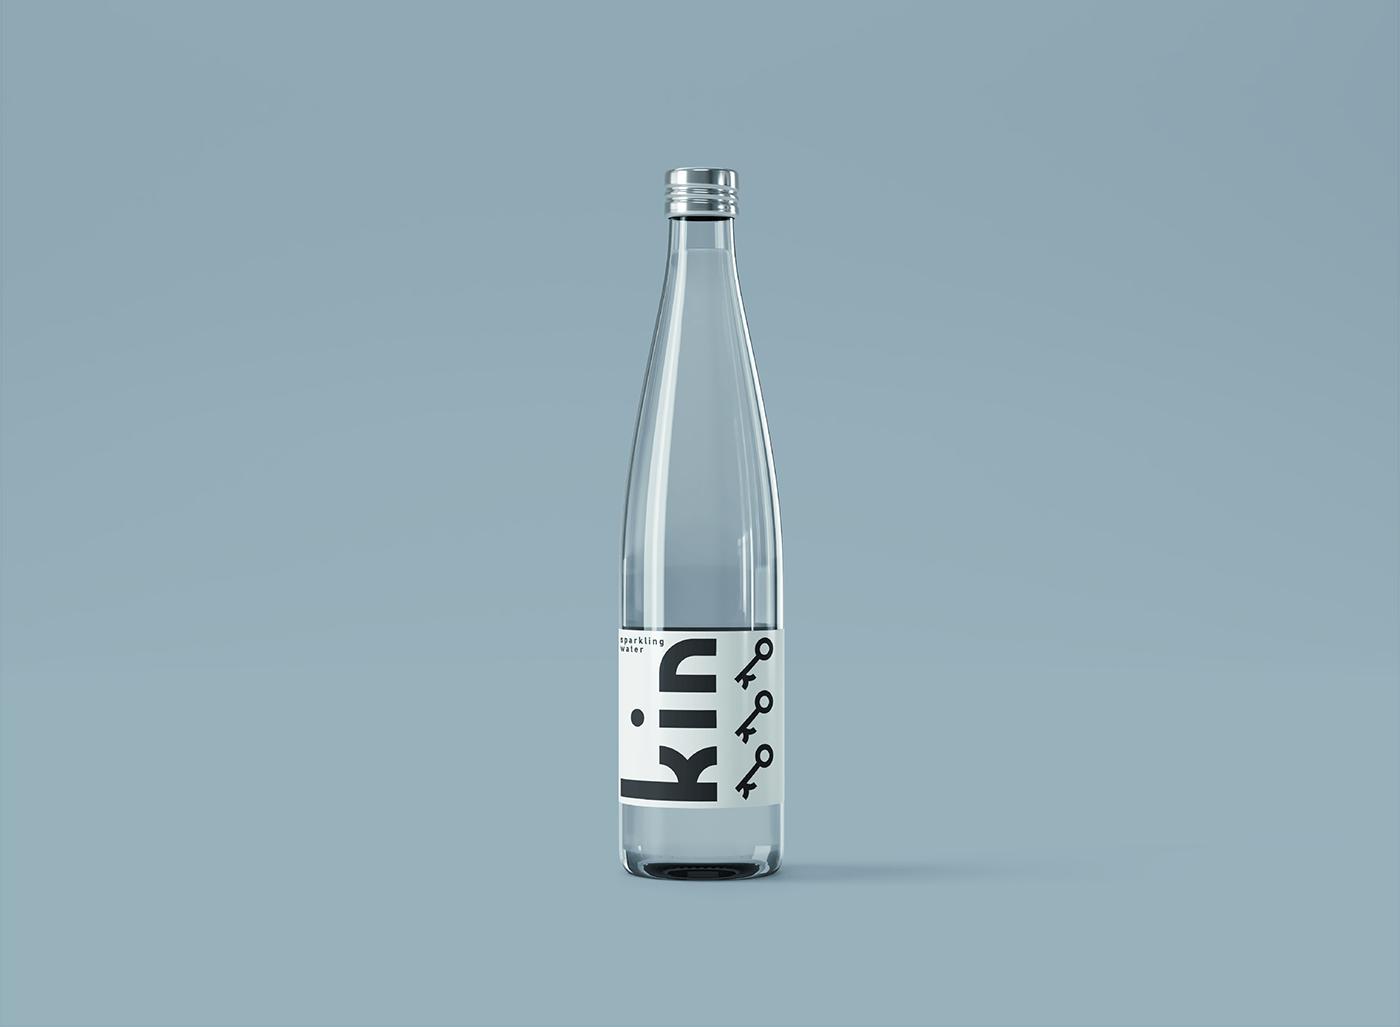 beverage bottle clean drink glass kin minimal Mockup modern water